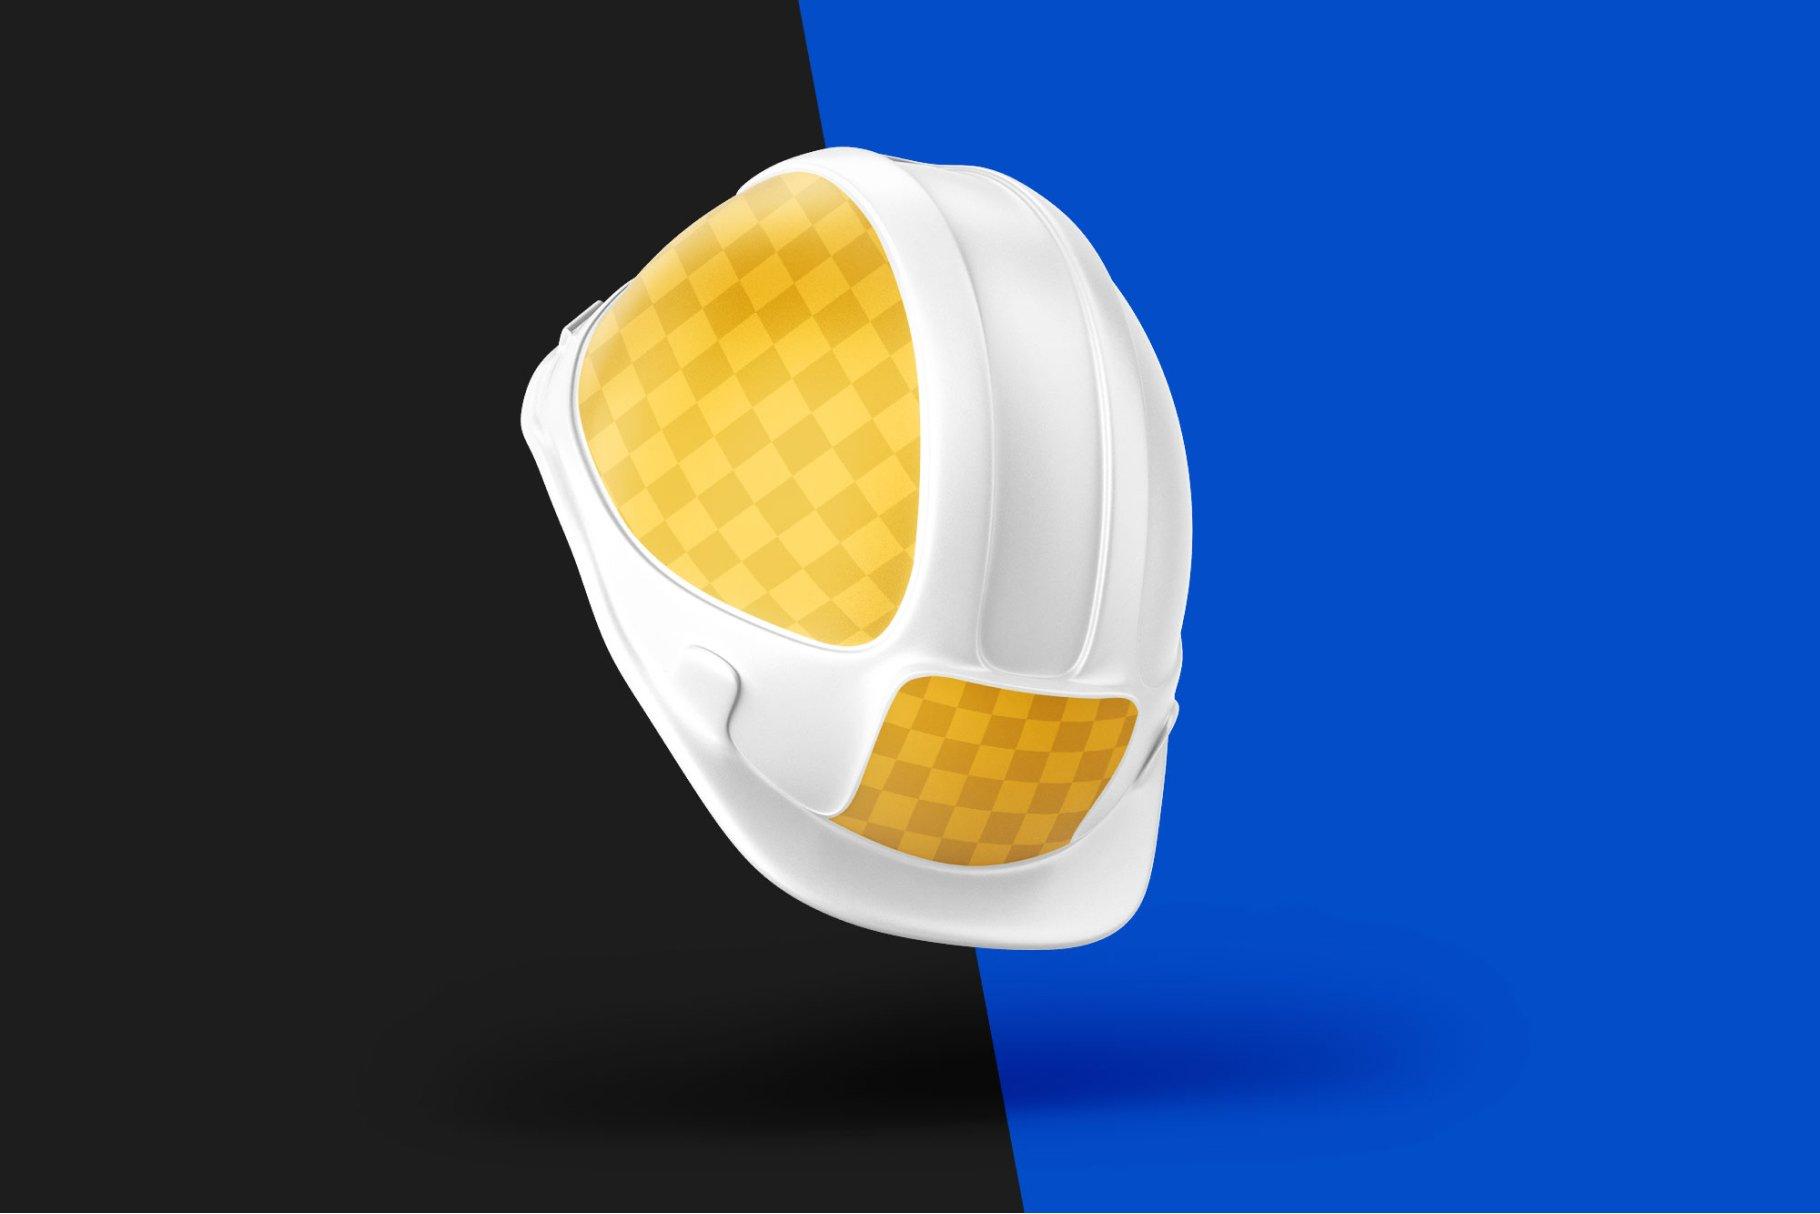 8款逼真工程安全帽头盔设计样机PSD模板素材 Construction Hard Hat Mockup Set插图4